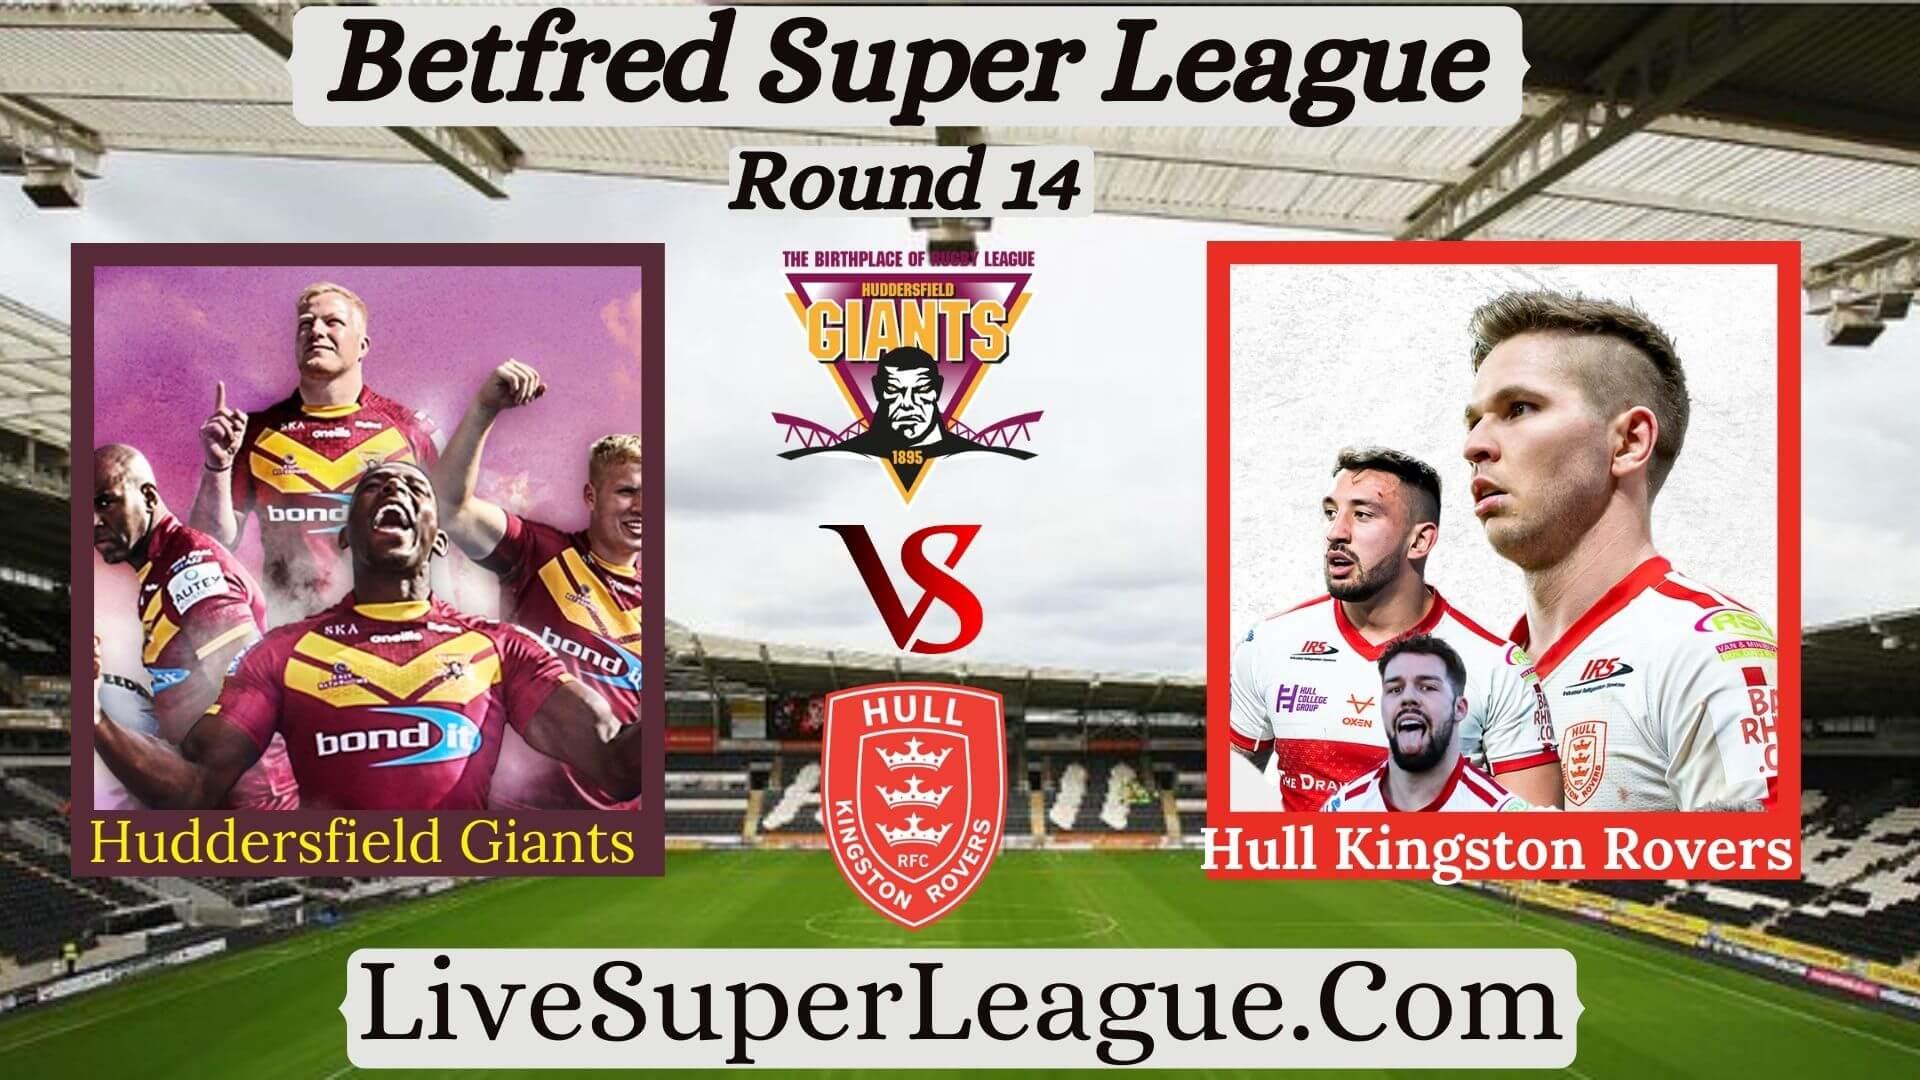 Huddersfield Giants Vs Hull Kingston Rovers Rd 14 Live Stream 2020 | Full Match Replay